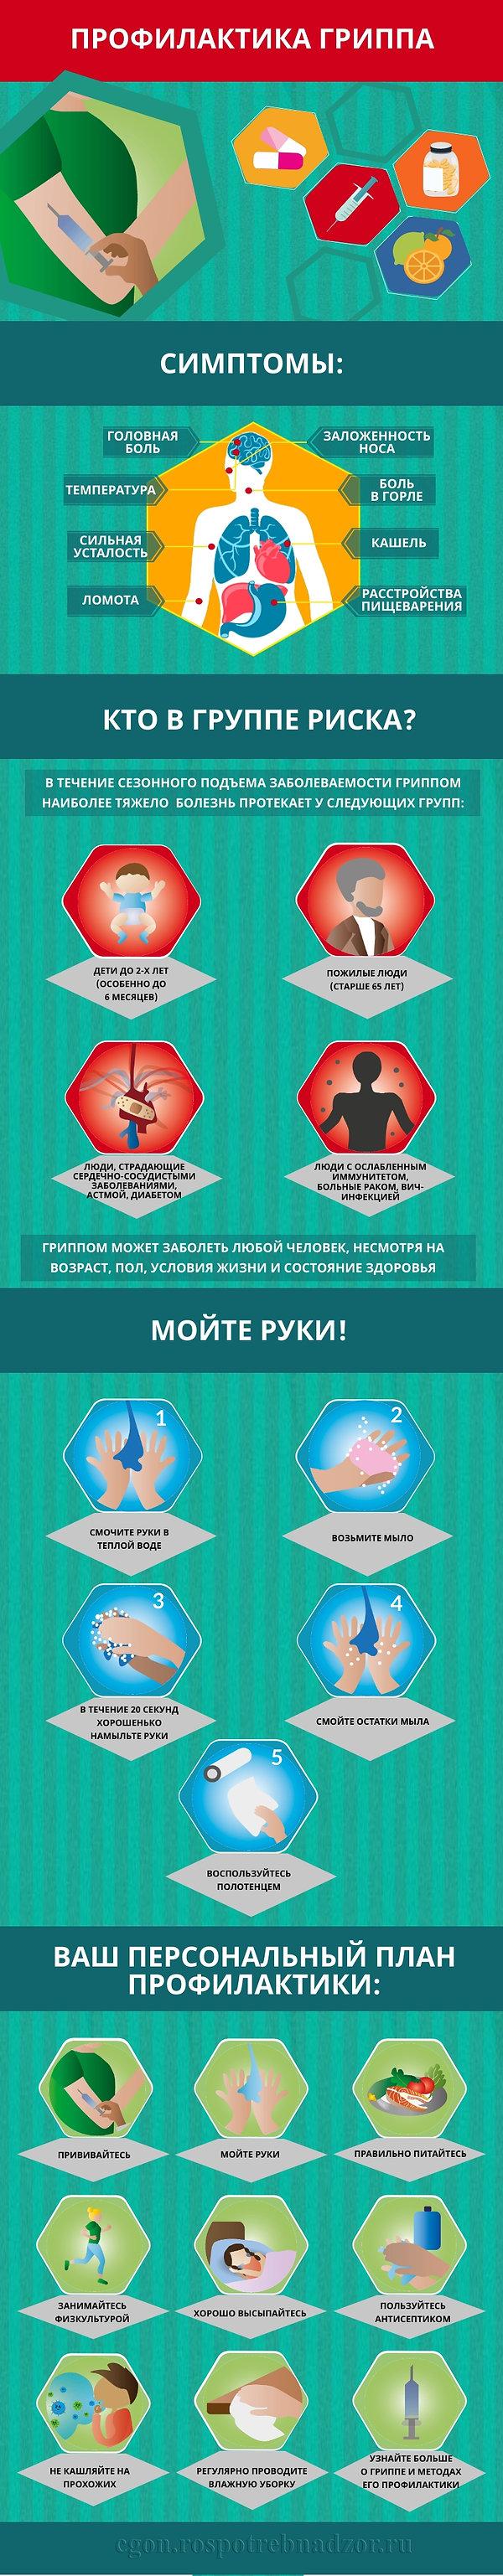 ПРОФИЛАКТИКА ГРИПП.jpg